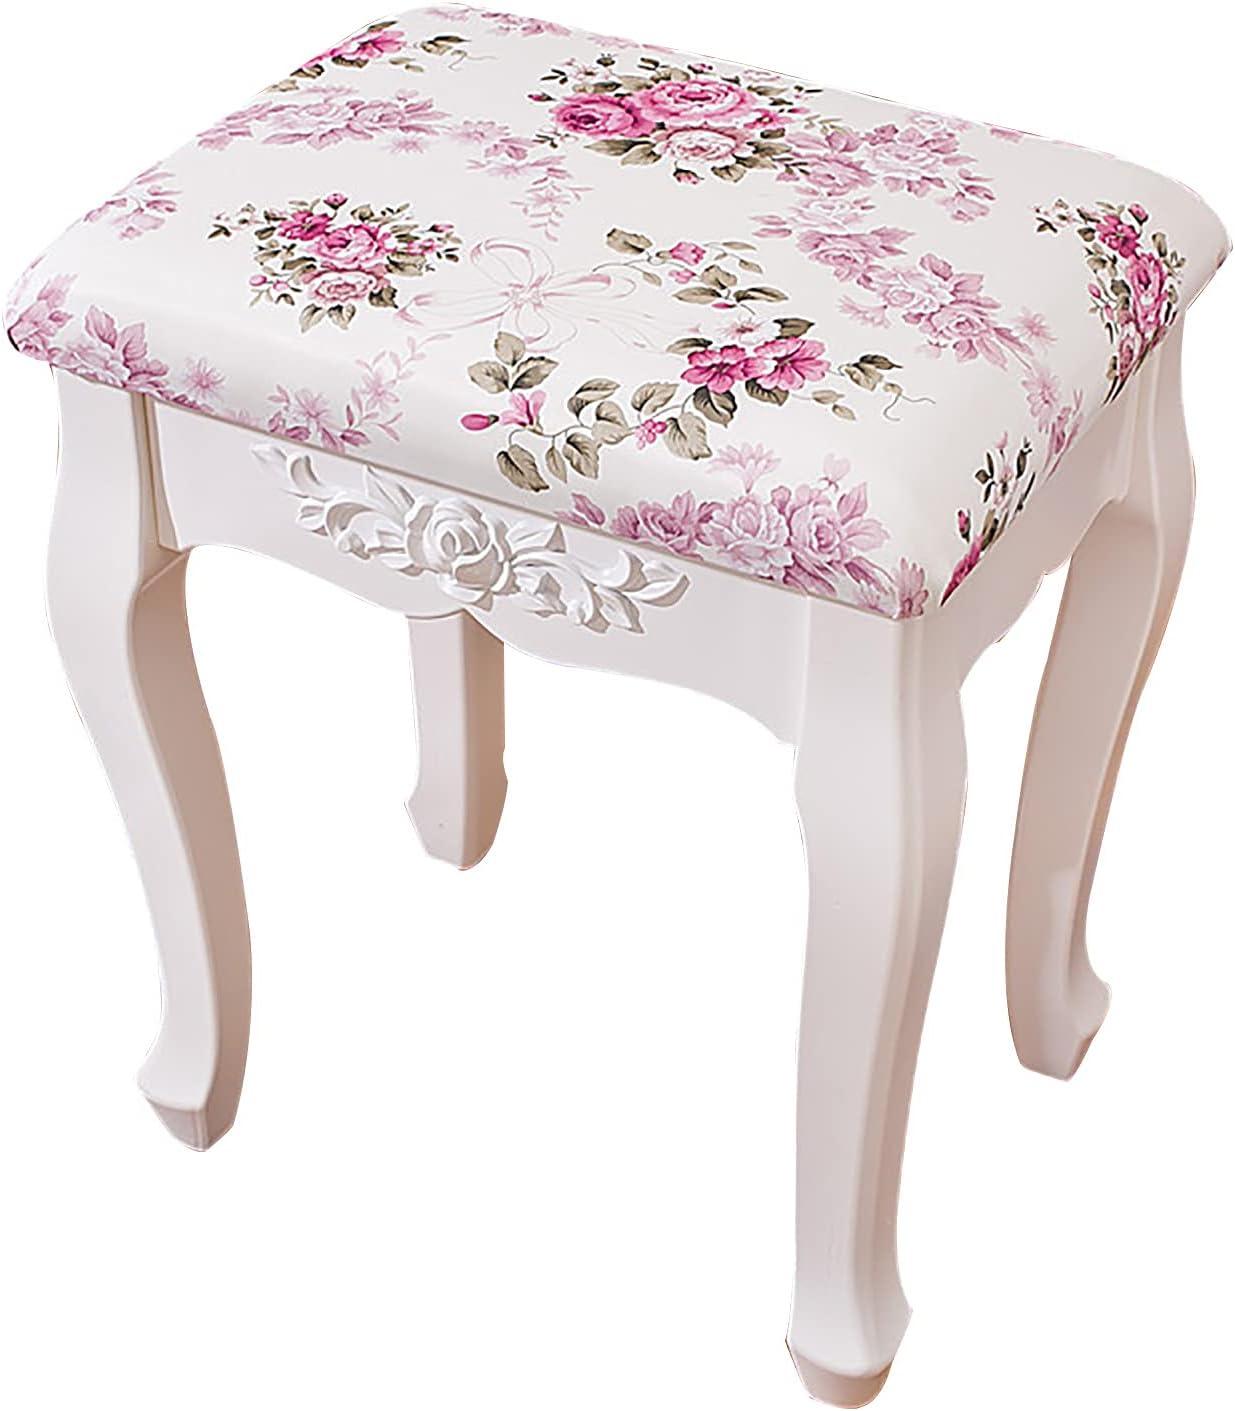 Seasonal Wrap Introduction Vanity Stool Dressing Padded Chair Makeup Be Spasm price Make Up Seat Piano